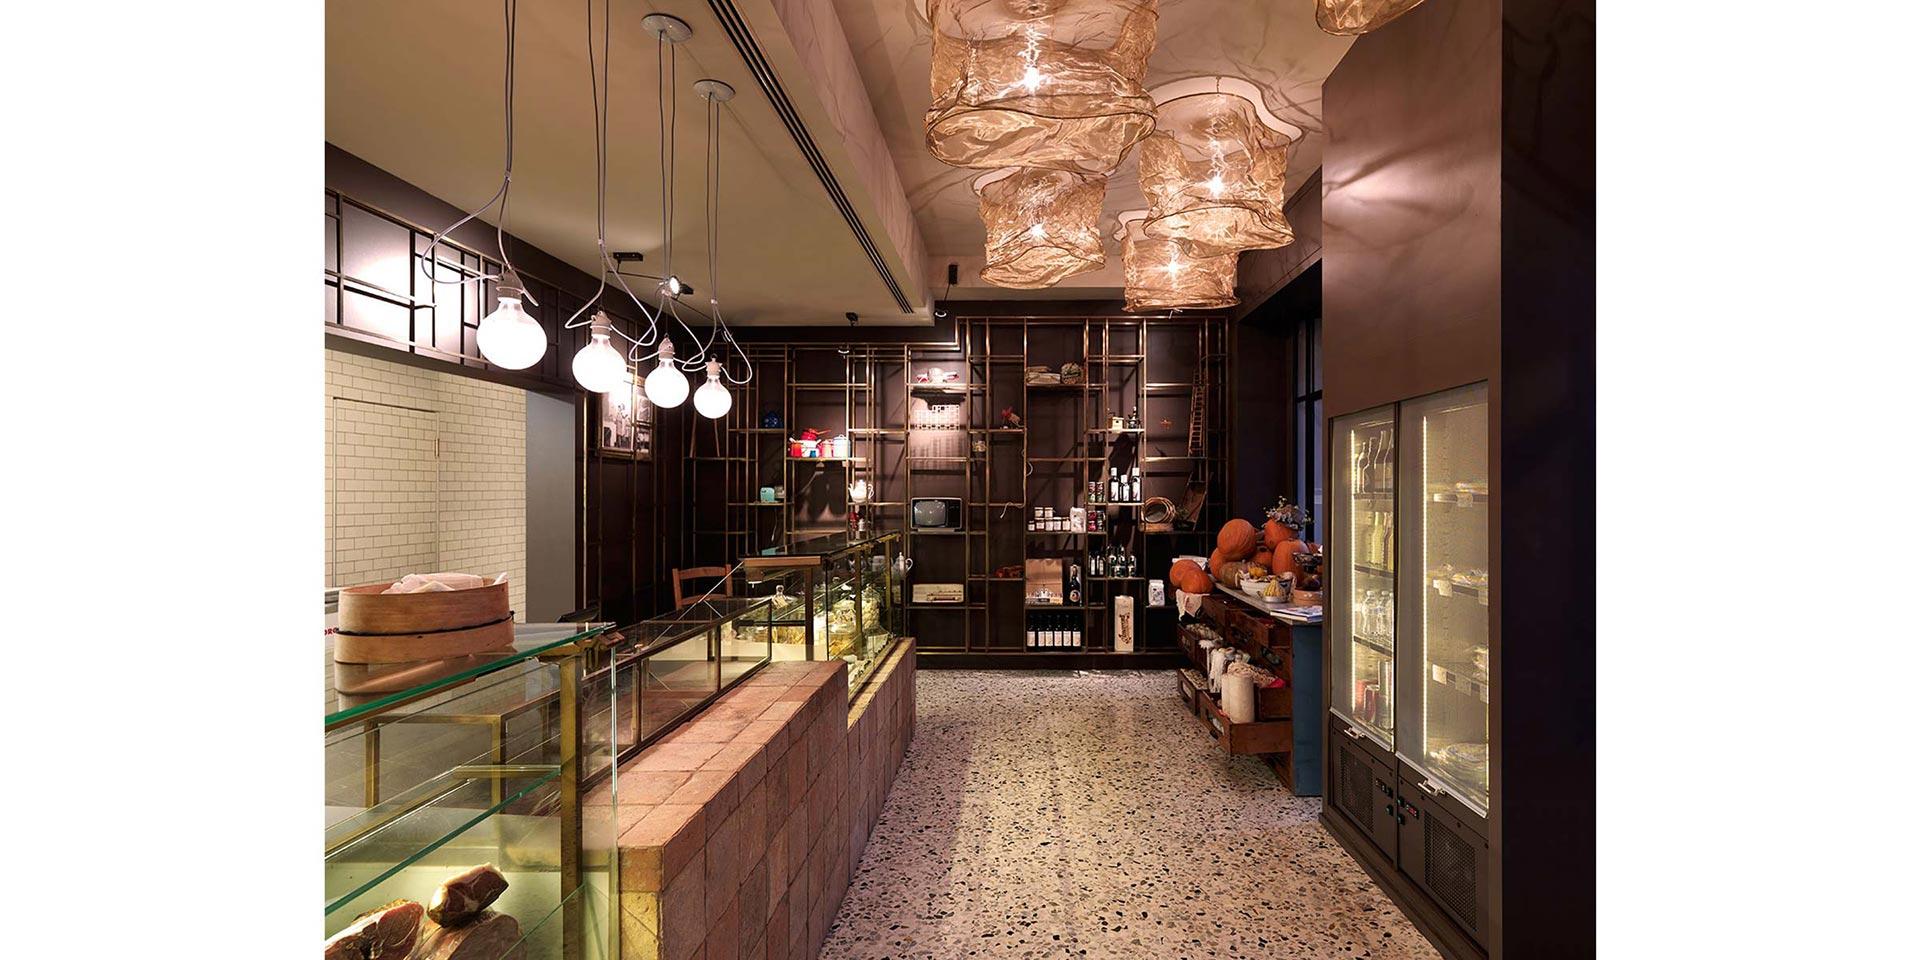 archinow_LEL_street-food-store_04